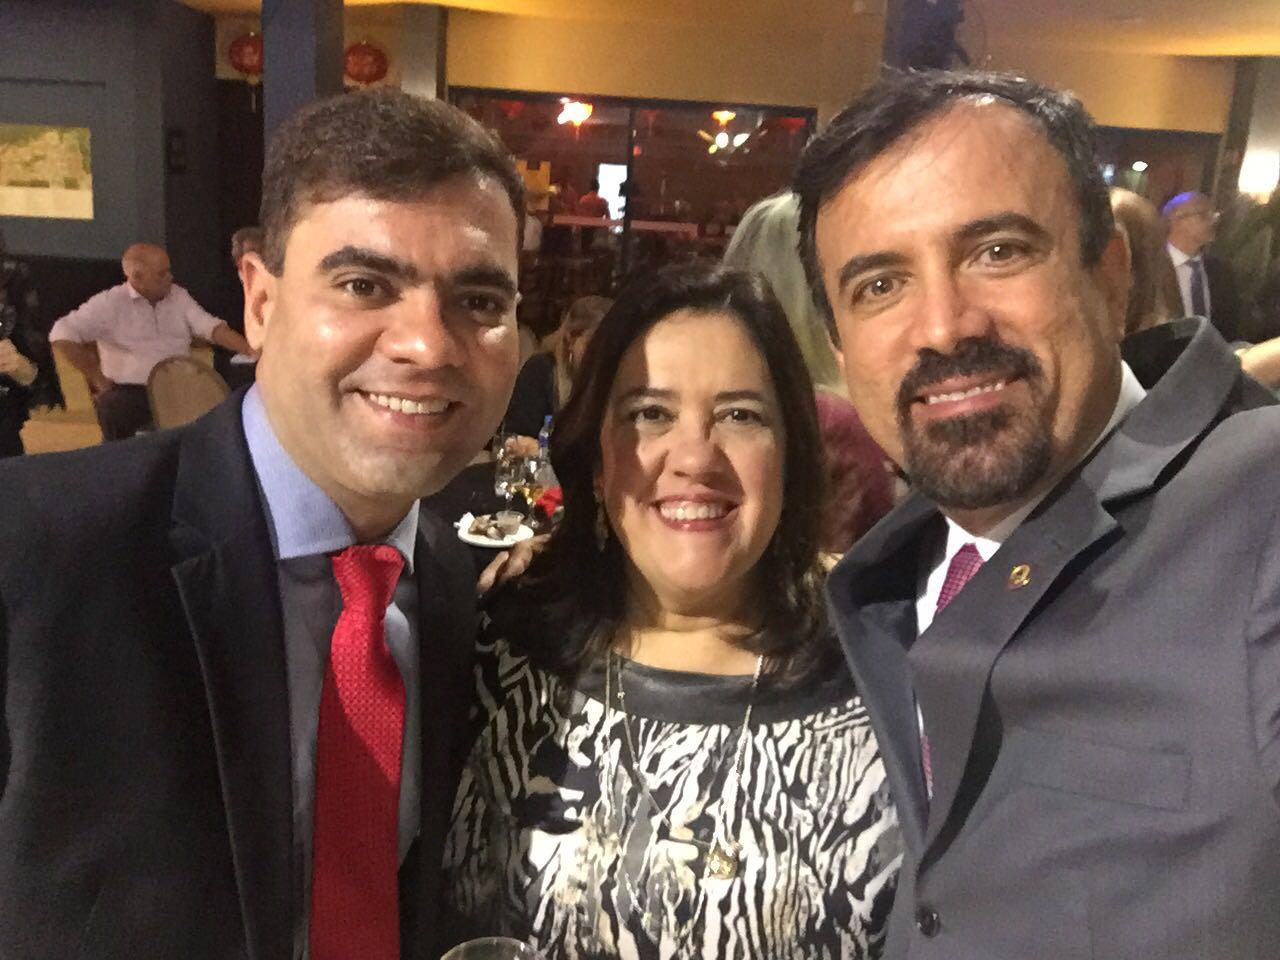 O Psicólogo e Hipnoterapeuta Tiago Araújo; Drs. Maria Angélica Behrens e Francisco Simões